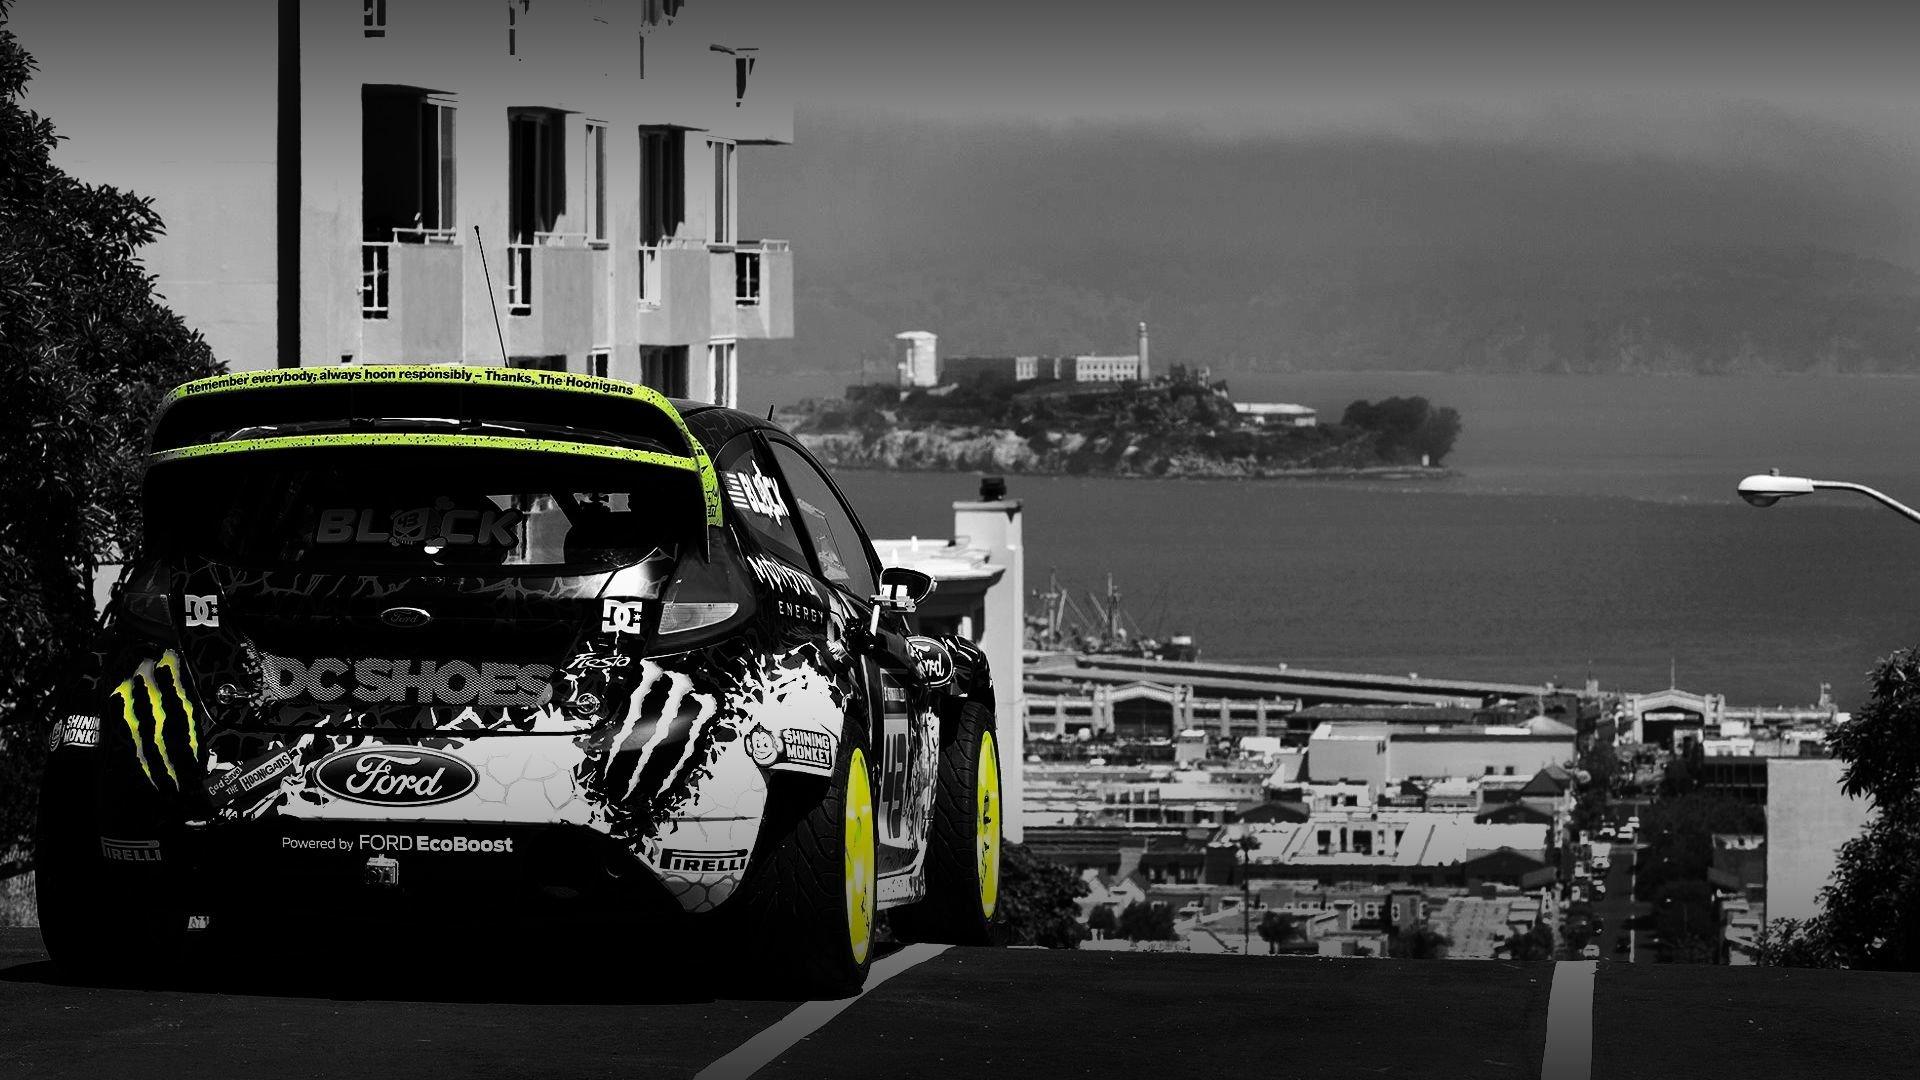 Vehicles - Race Car  San Francisco Ken Block Wallpaper